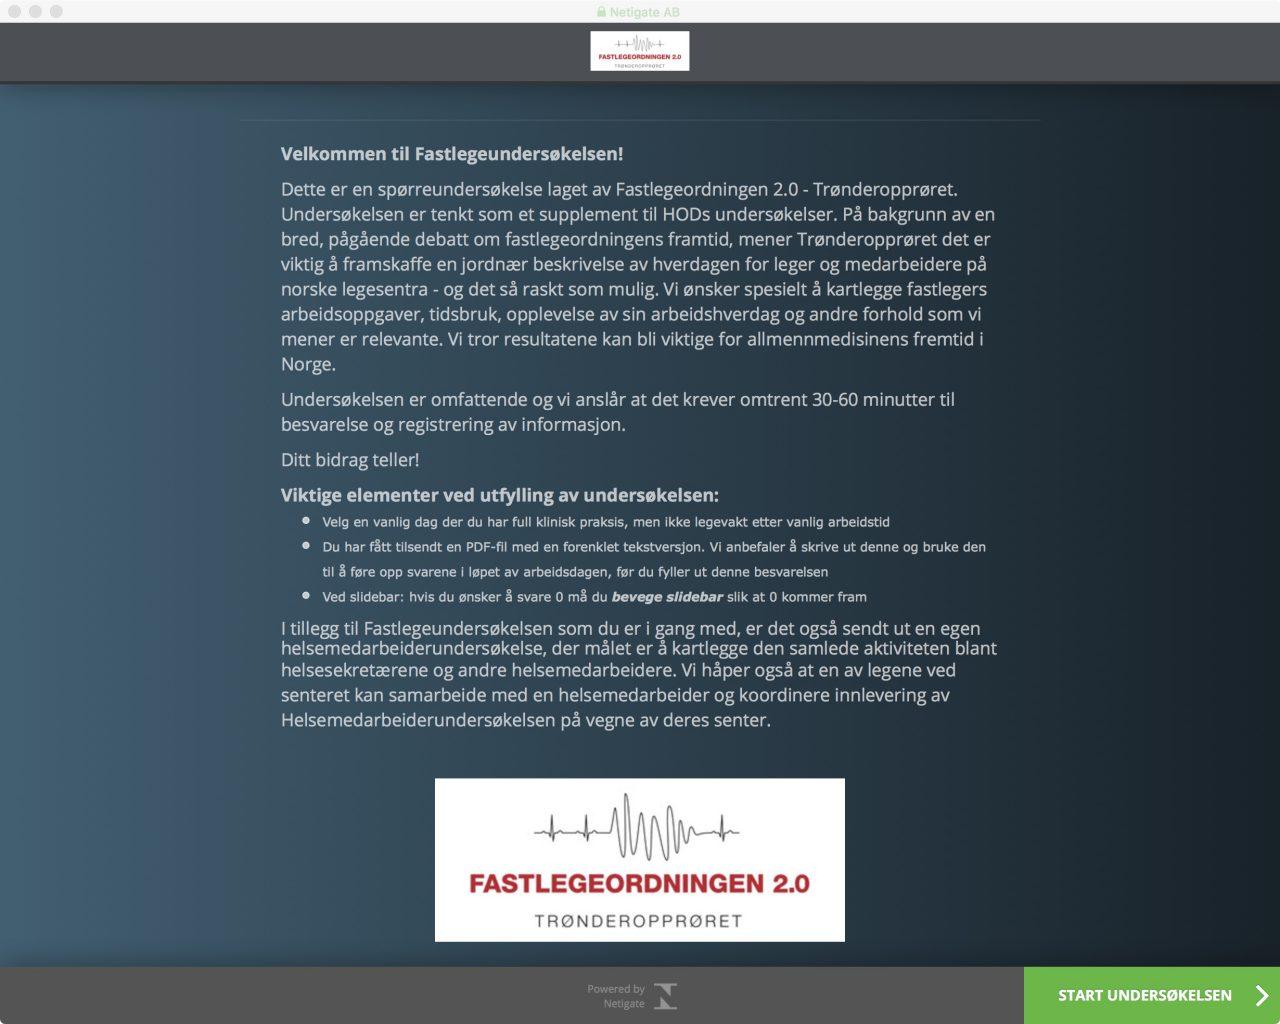 Introduksjon-Fastlegeundersøkelsen-1280x1024.jpeg